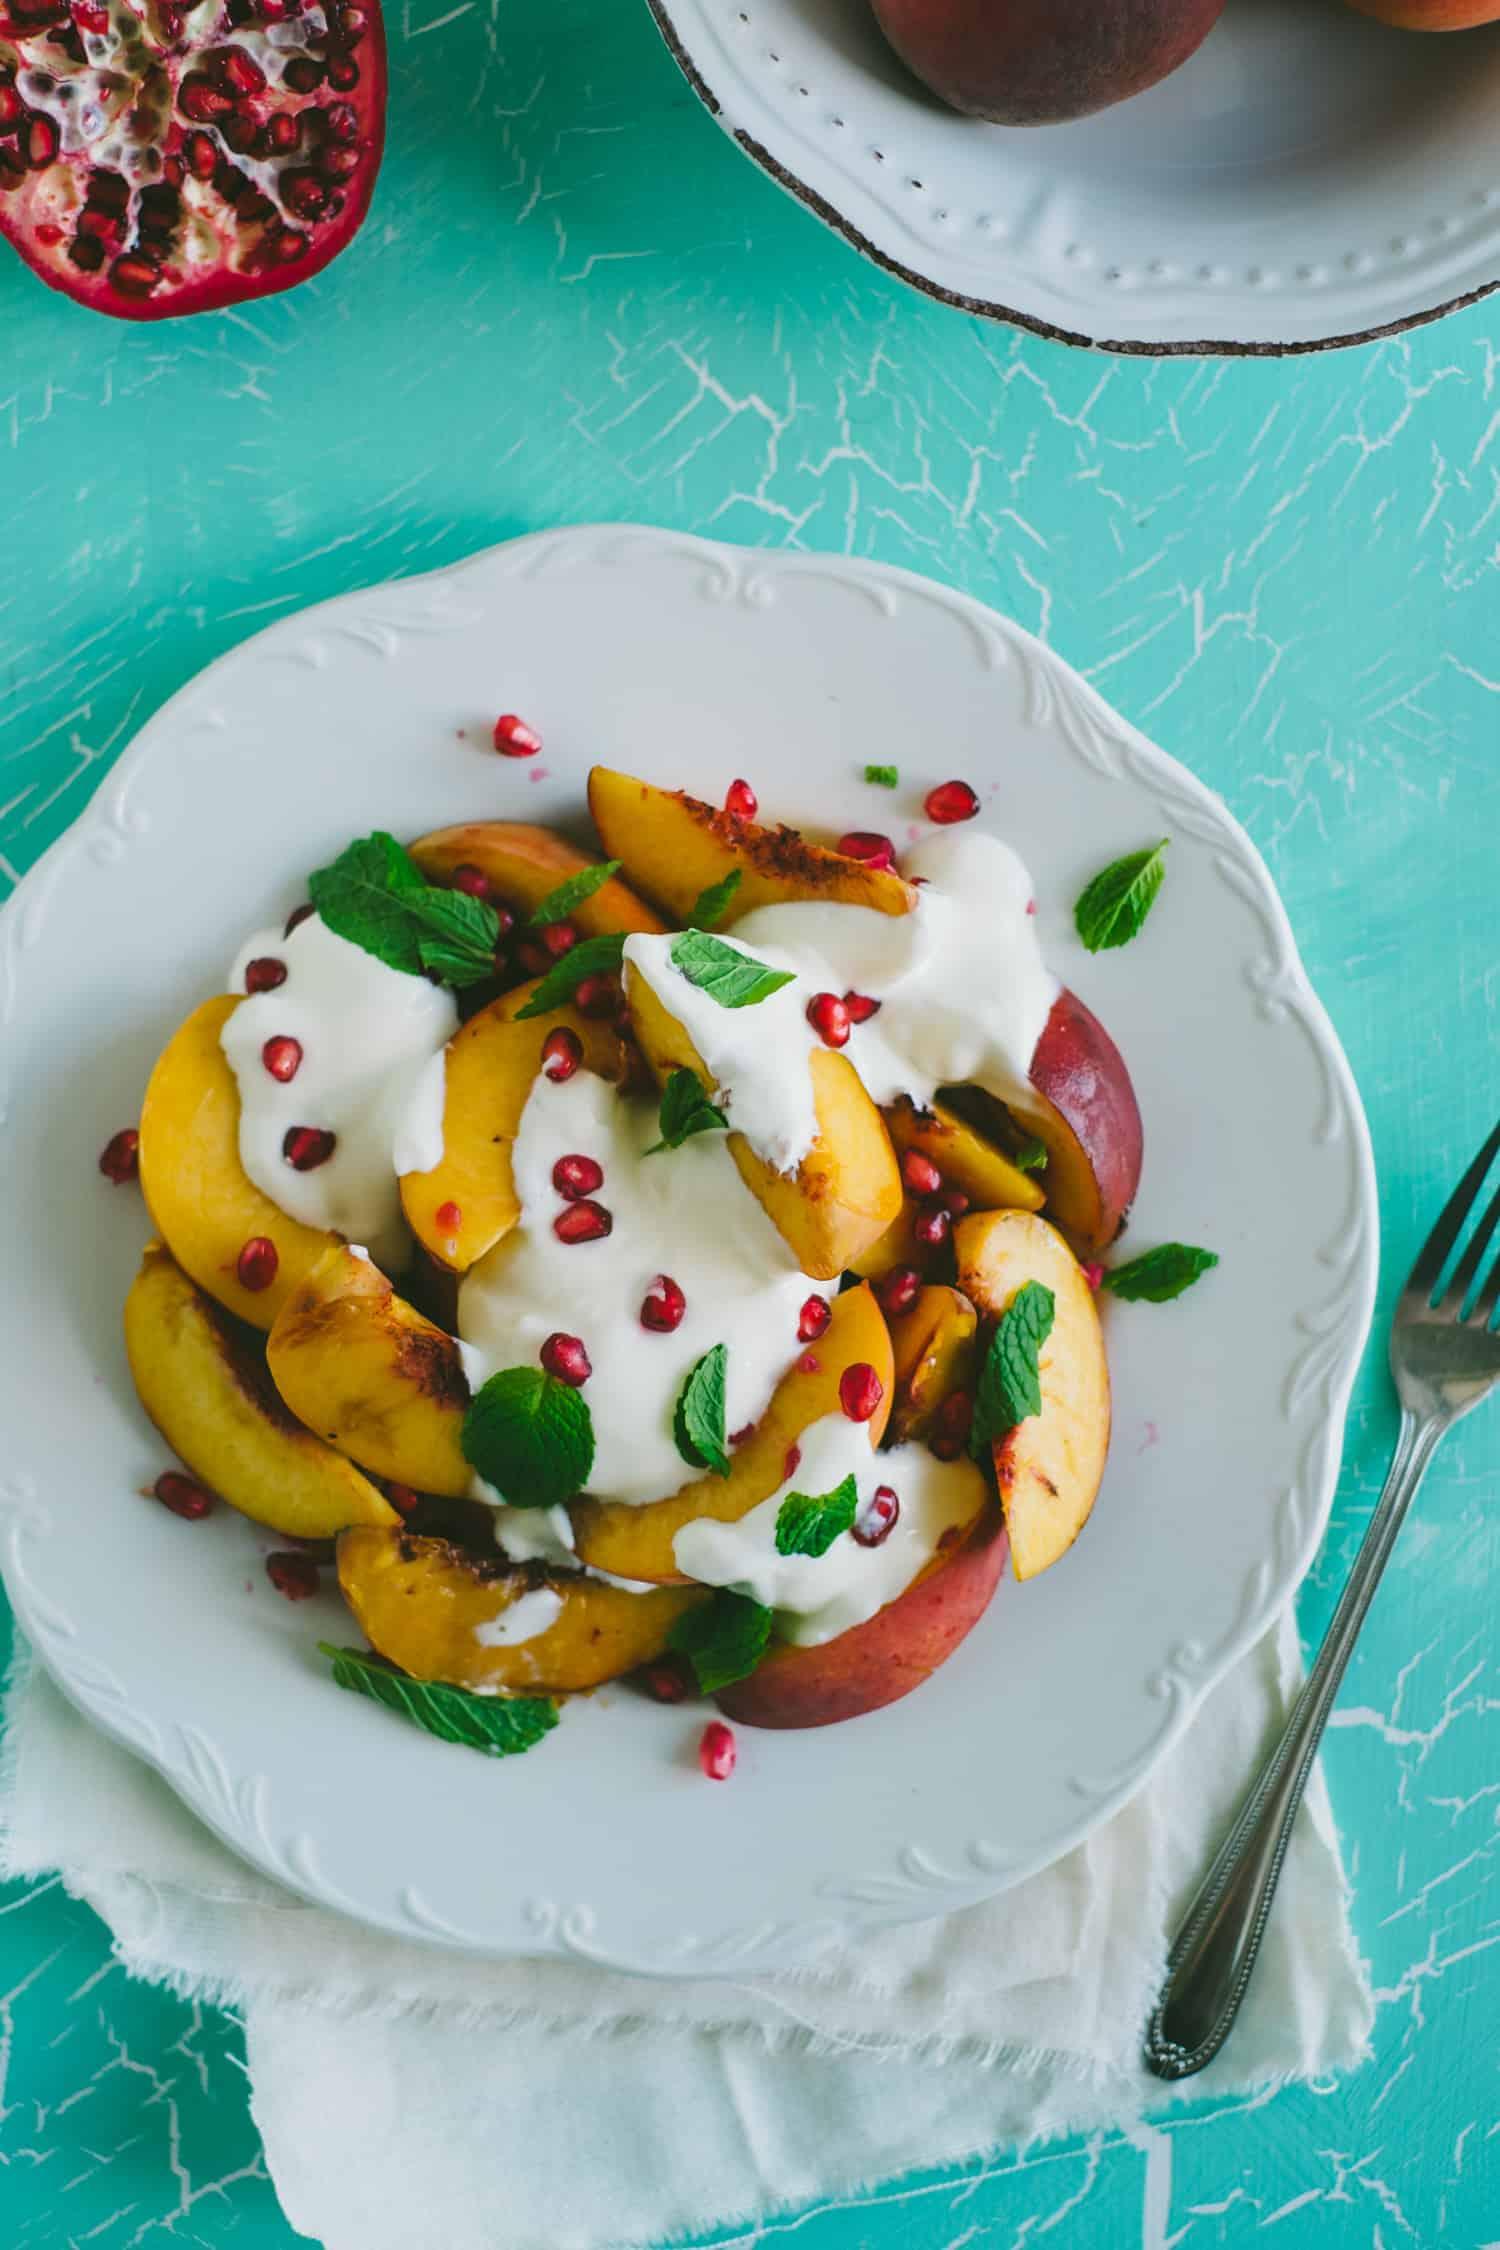 peach salad with yoghurt